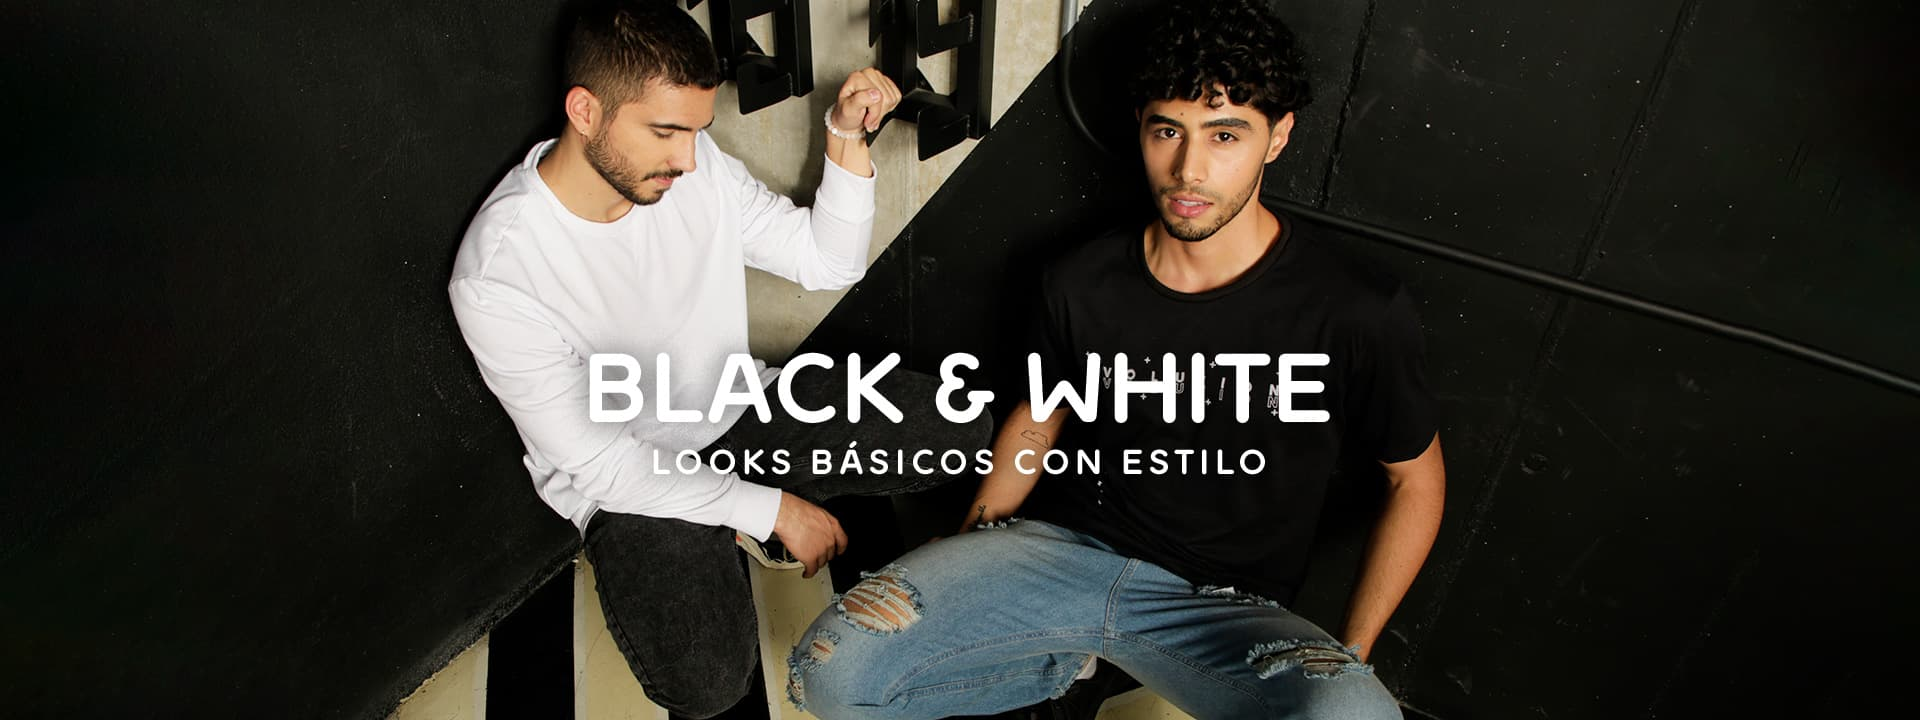 Like Me Black and White